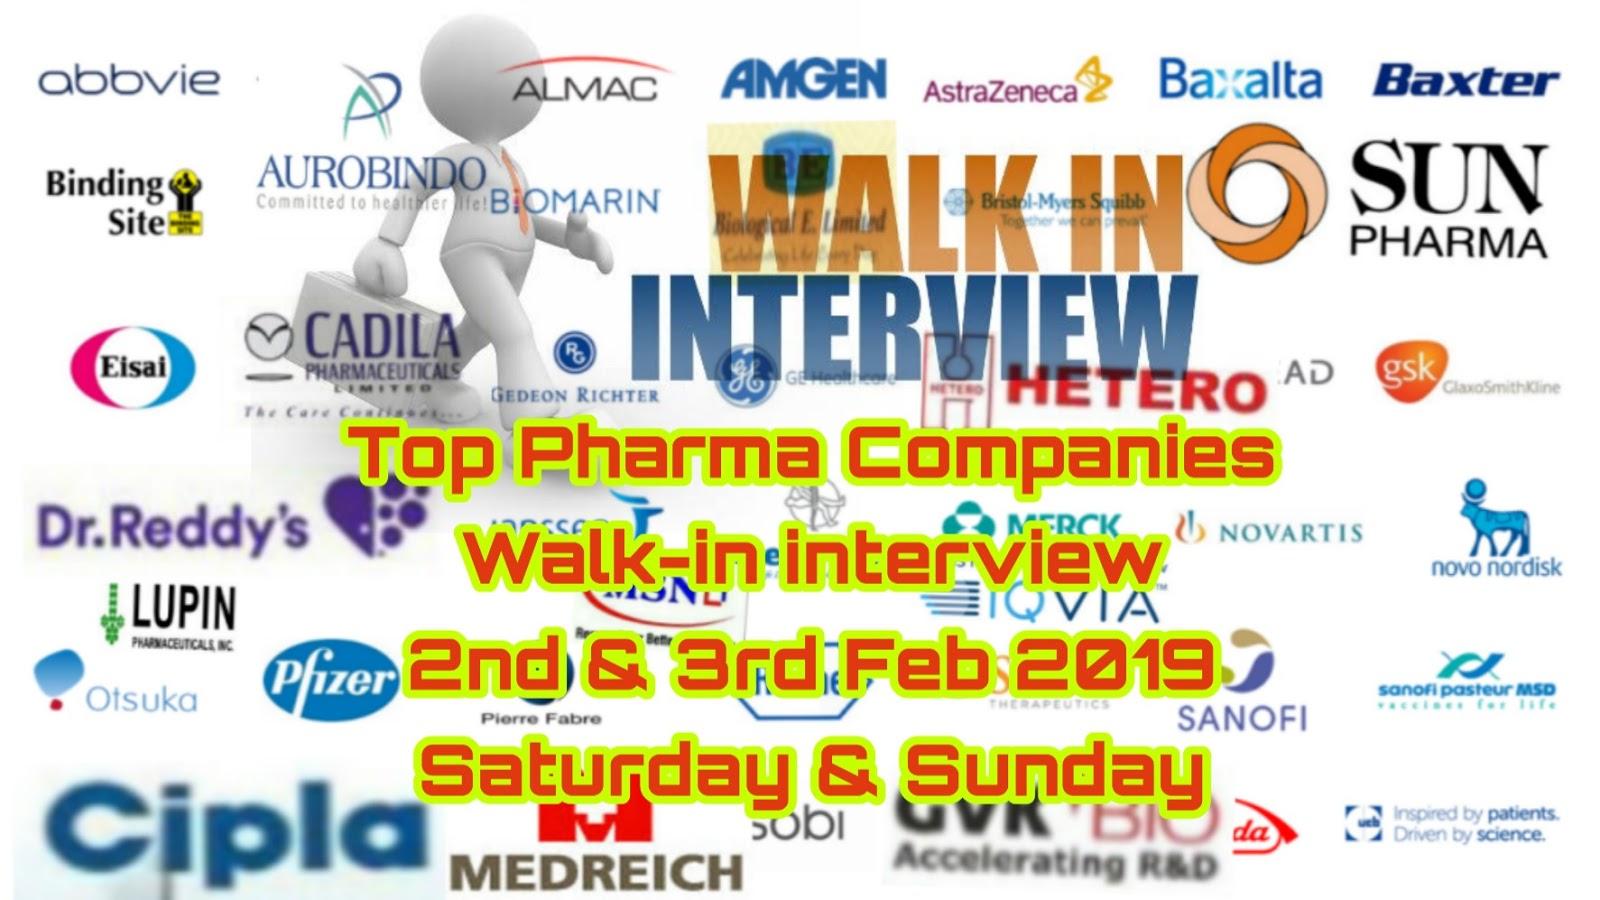 Top pharma companies | Walk-in interview on 2nd & 3rd Feb